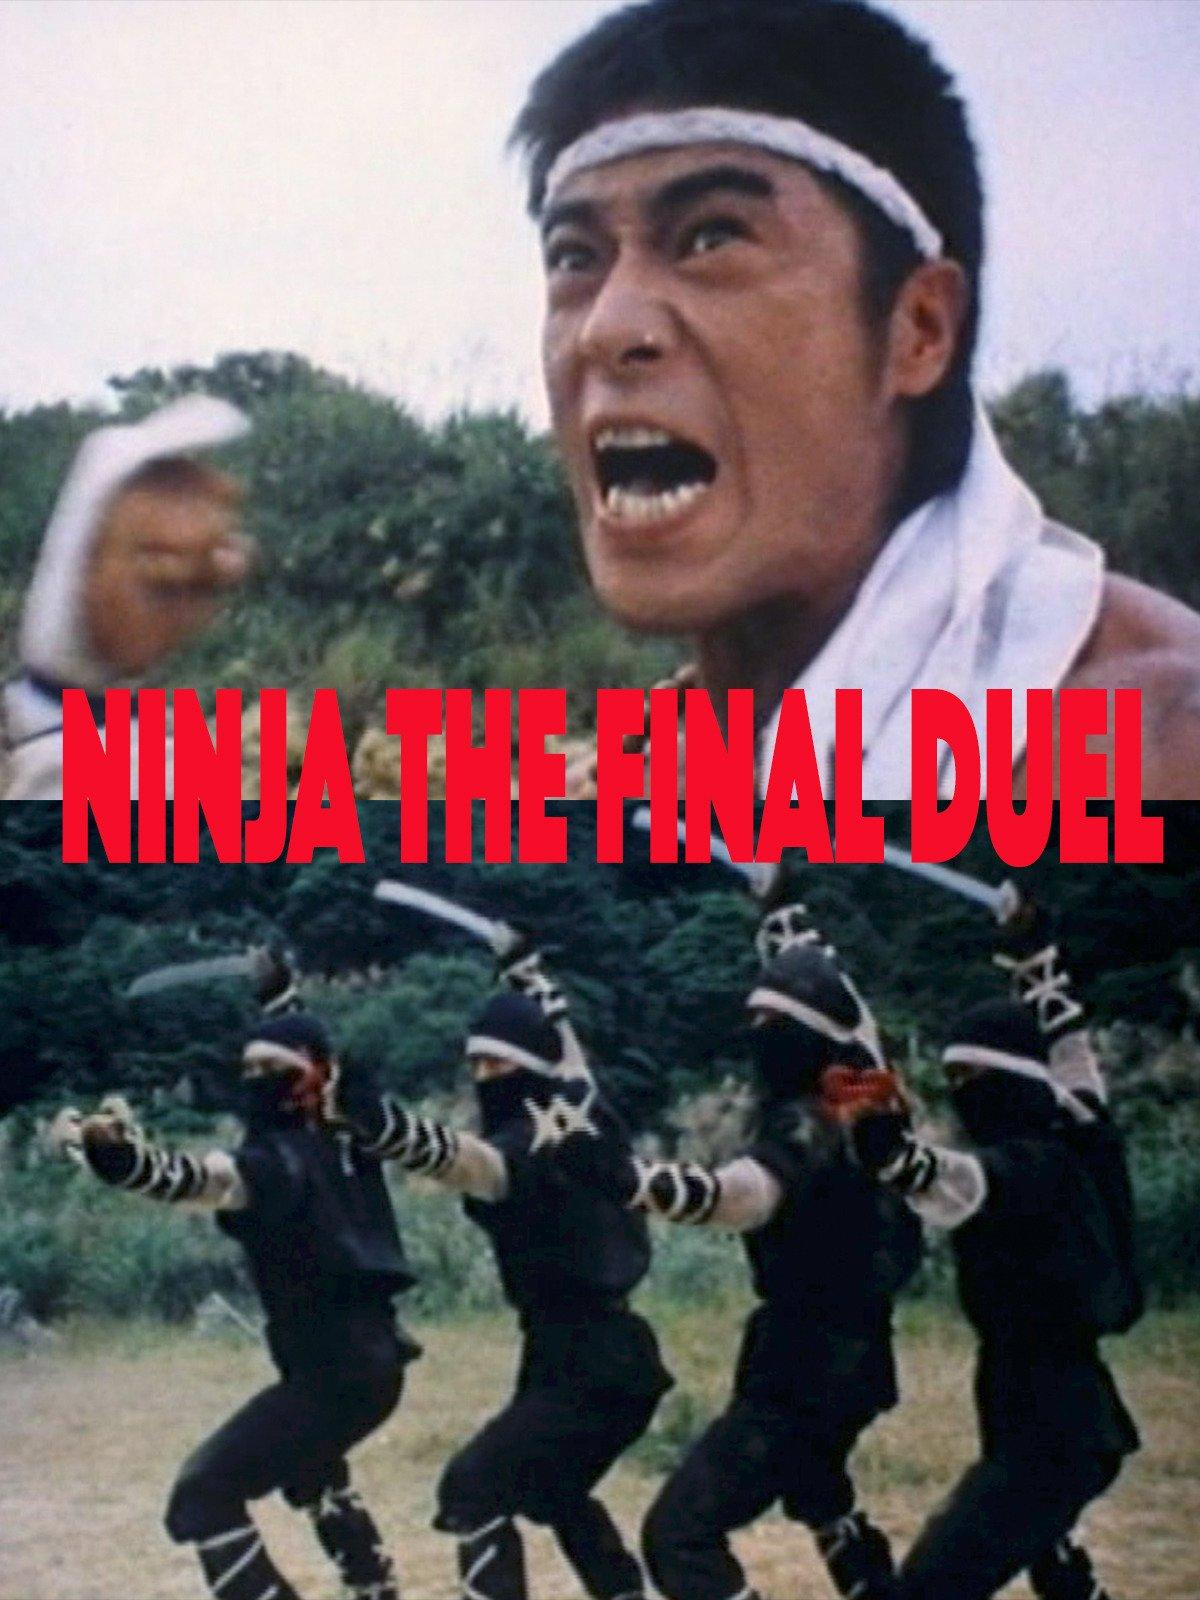 Ninja The Final Duel on Amazon Prime Video UK